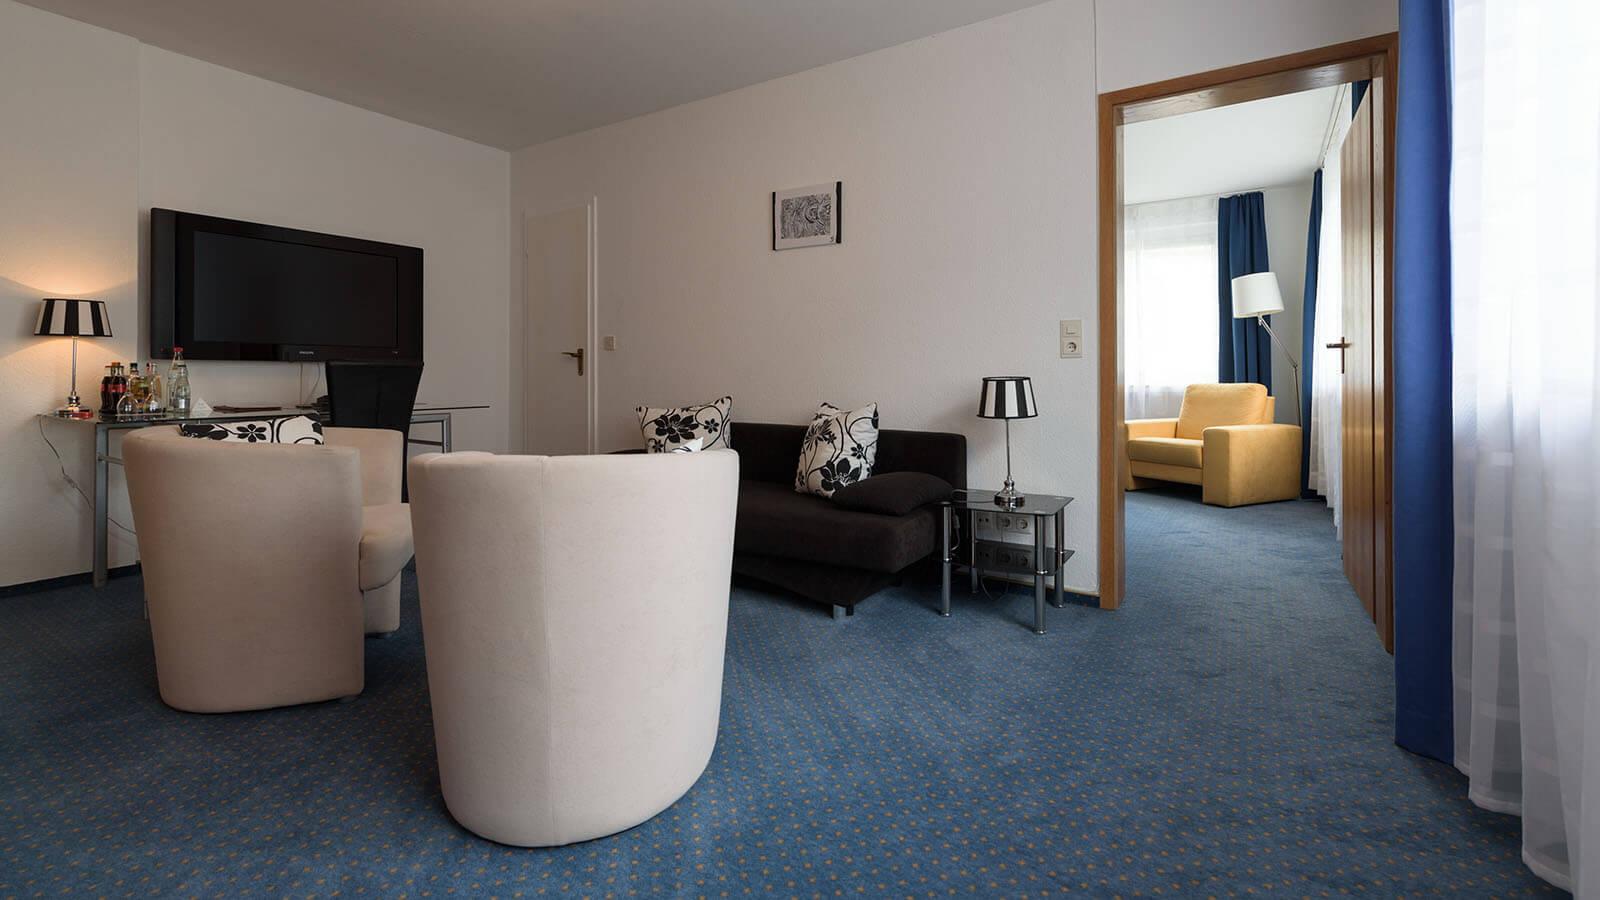 Appartement im Hotel Goethe Haus